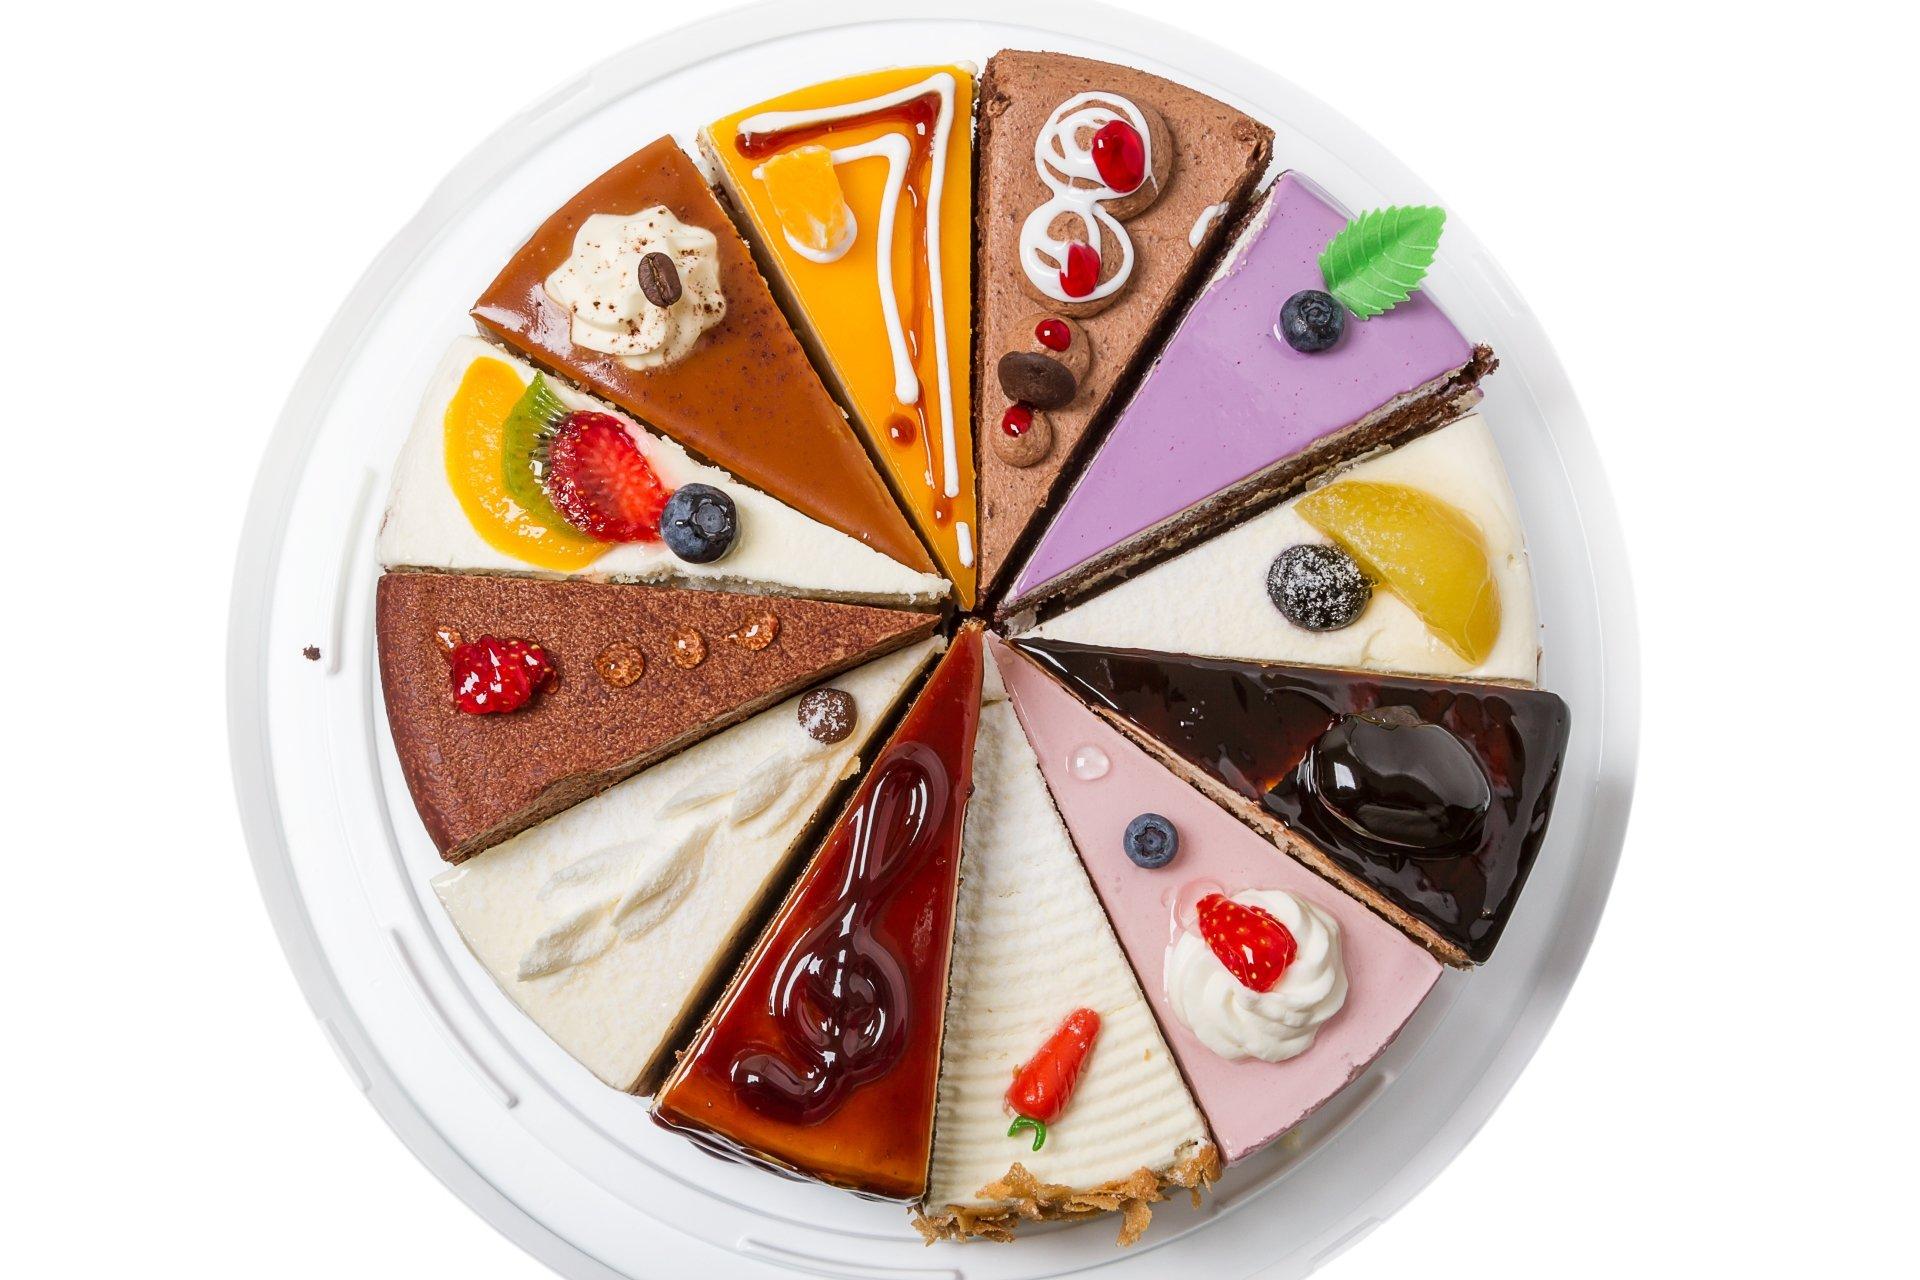 Food - Cake  Pastry Dessert Wallpaper